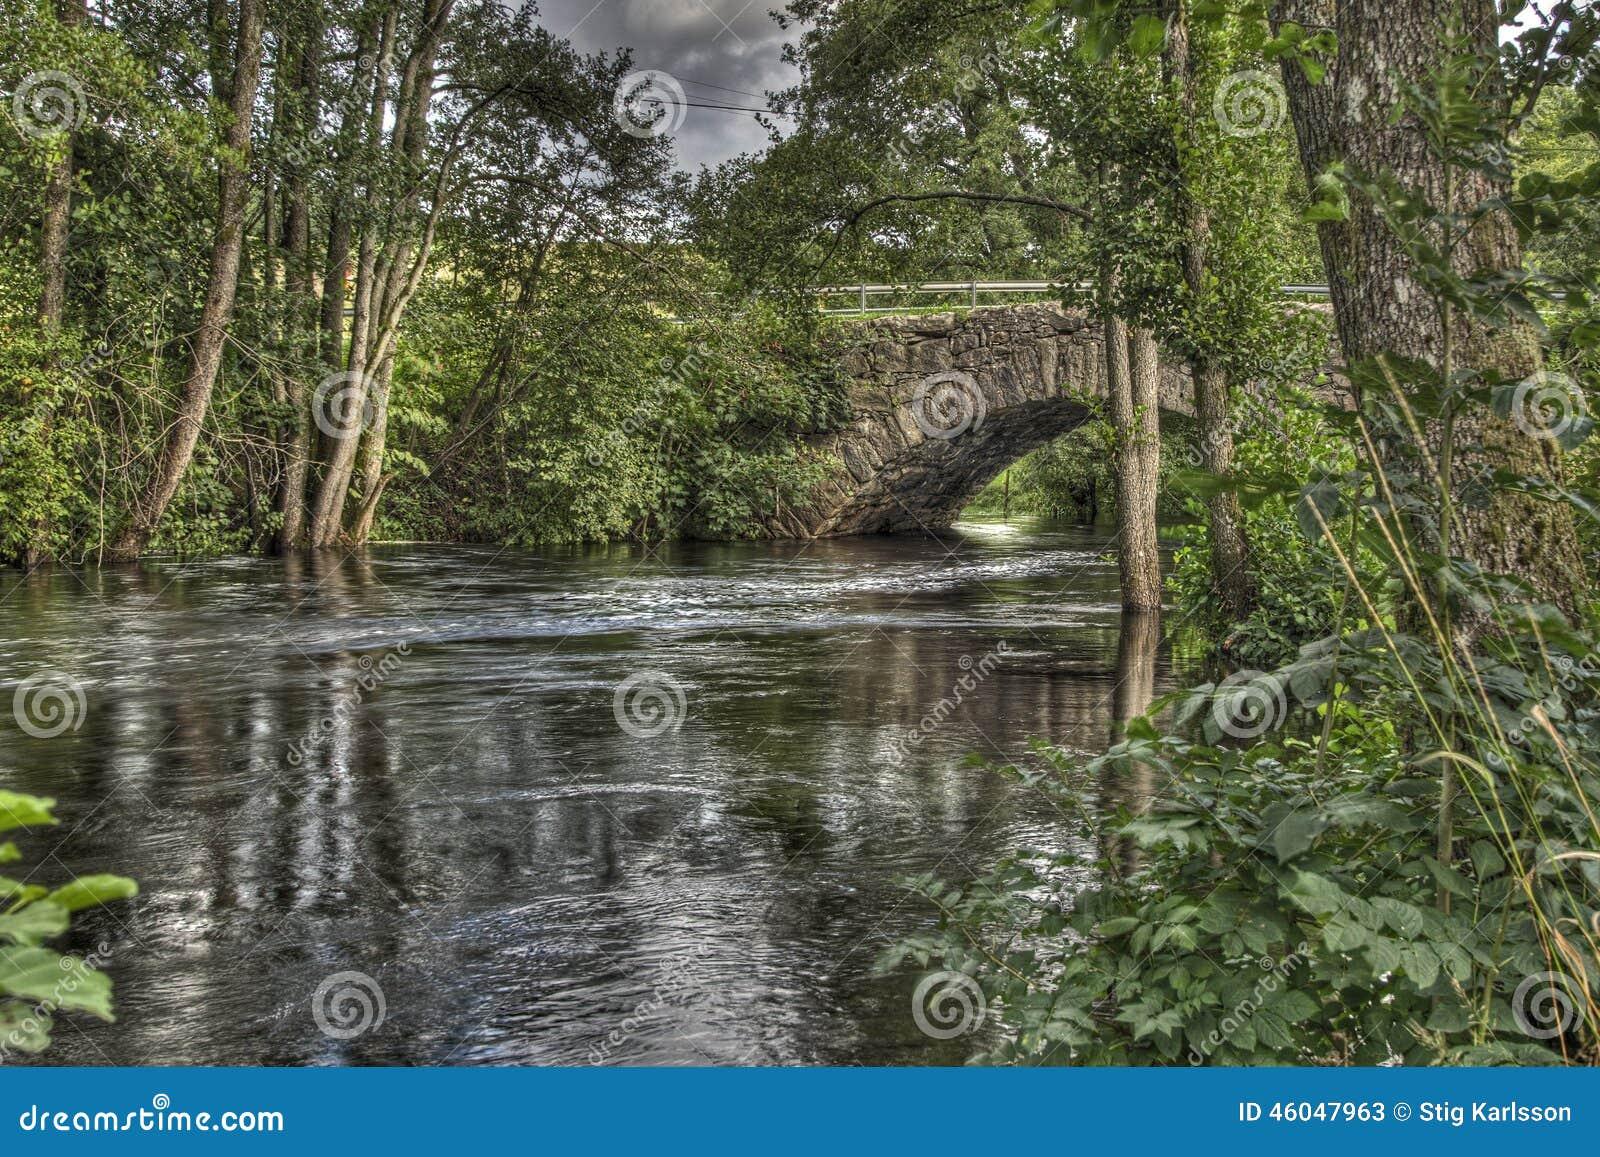 hdr old bridge and - photo #30